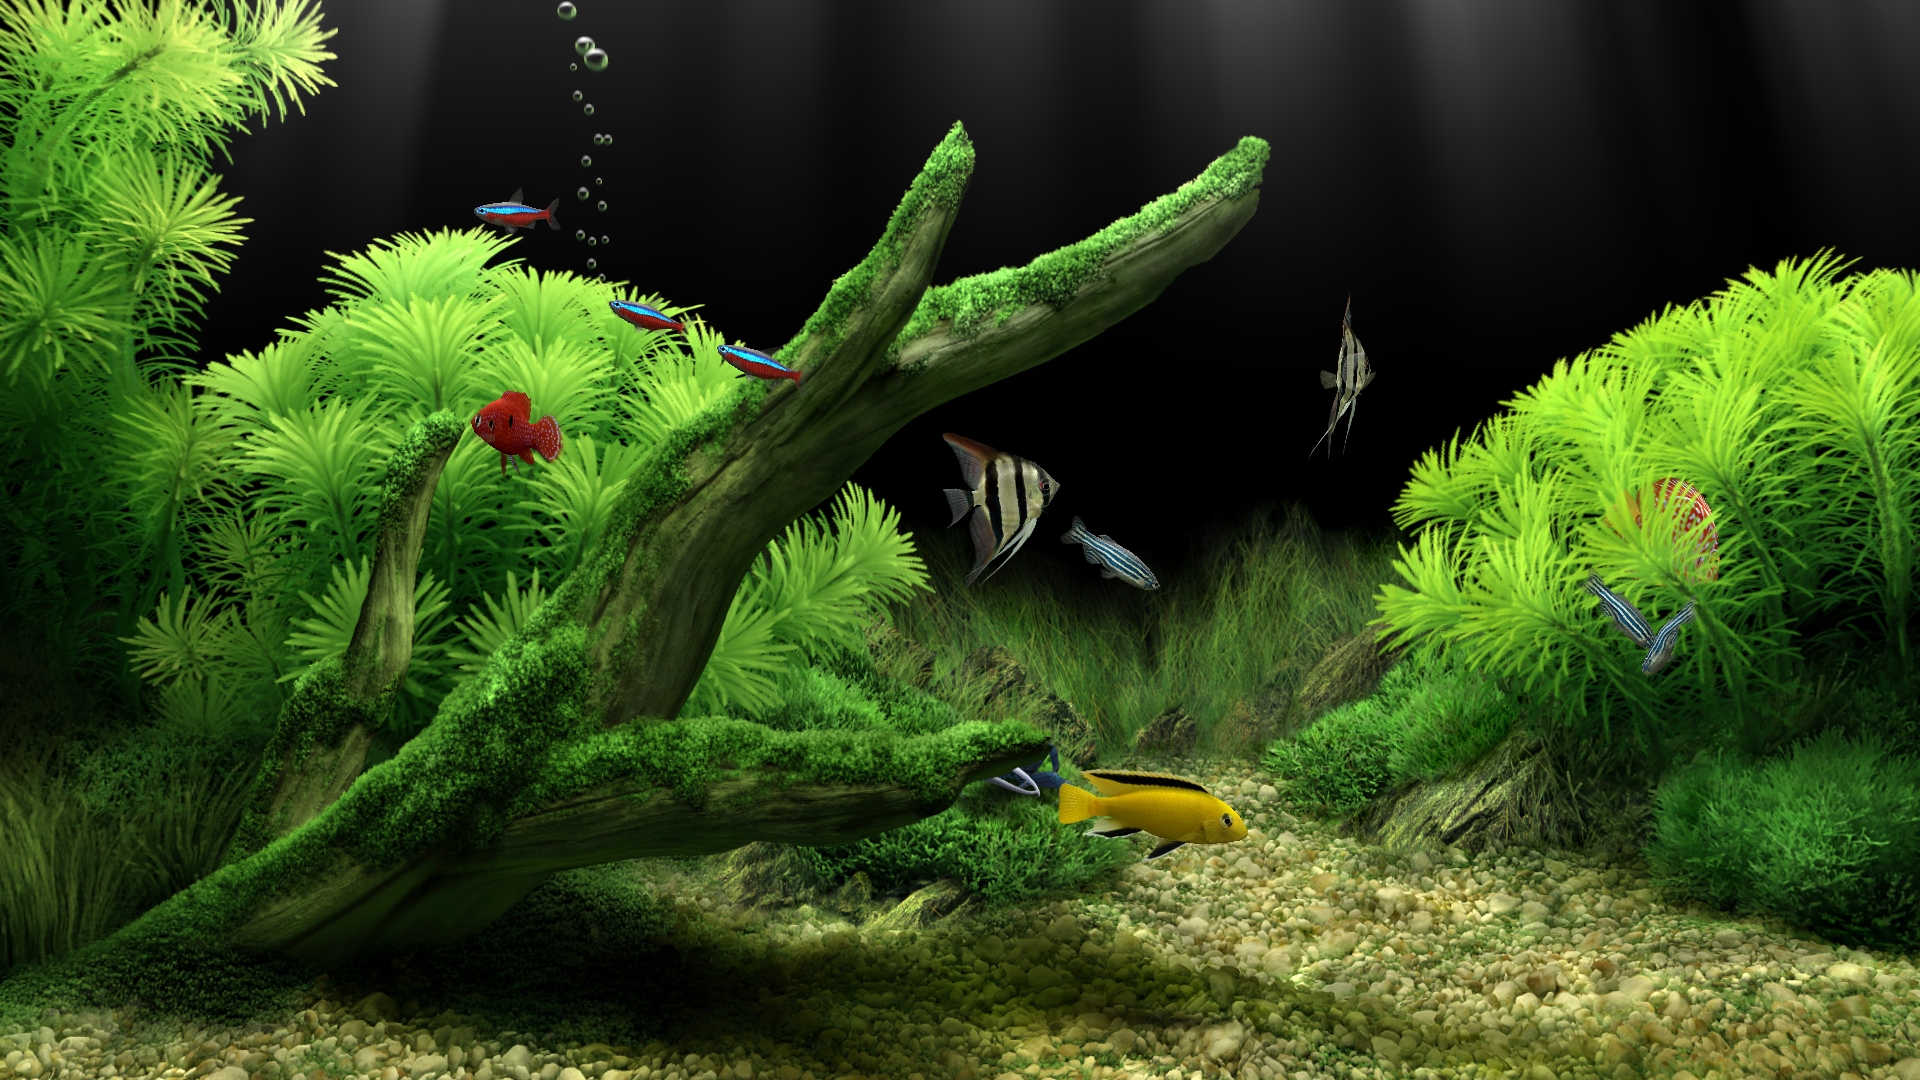 Virtual fish tank aquarium google - The Huge Size Of The Screenshots Is Intentional My Native Screen Resolution But Jpg Some Artifacts Run On A Screen 53x30 Cm